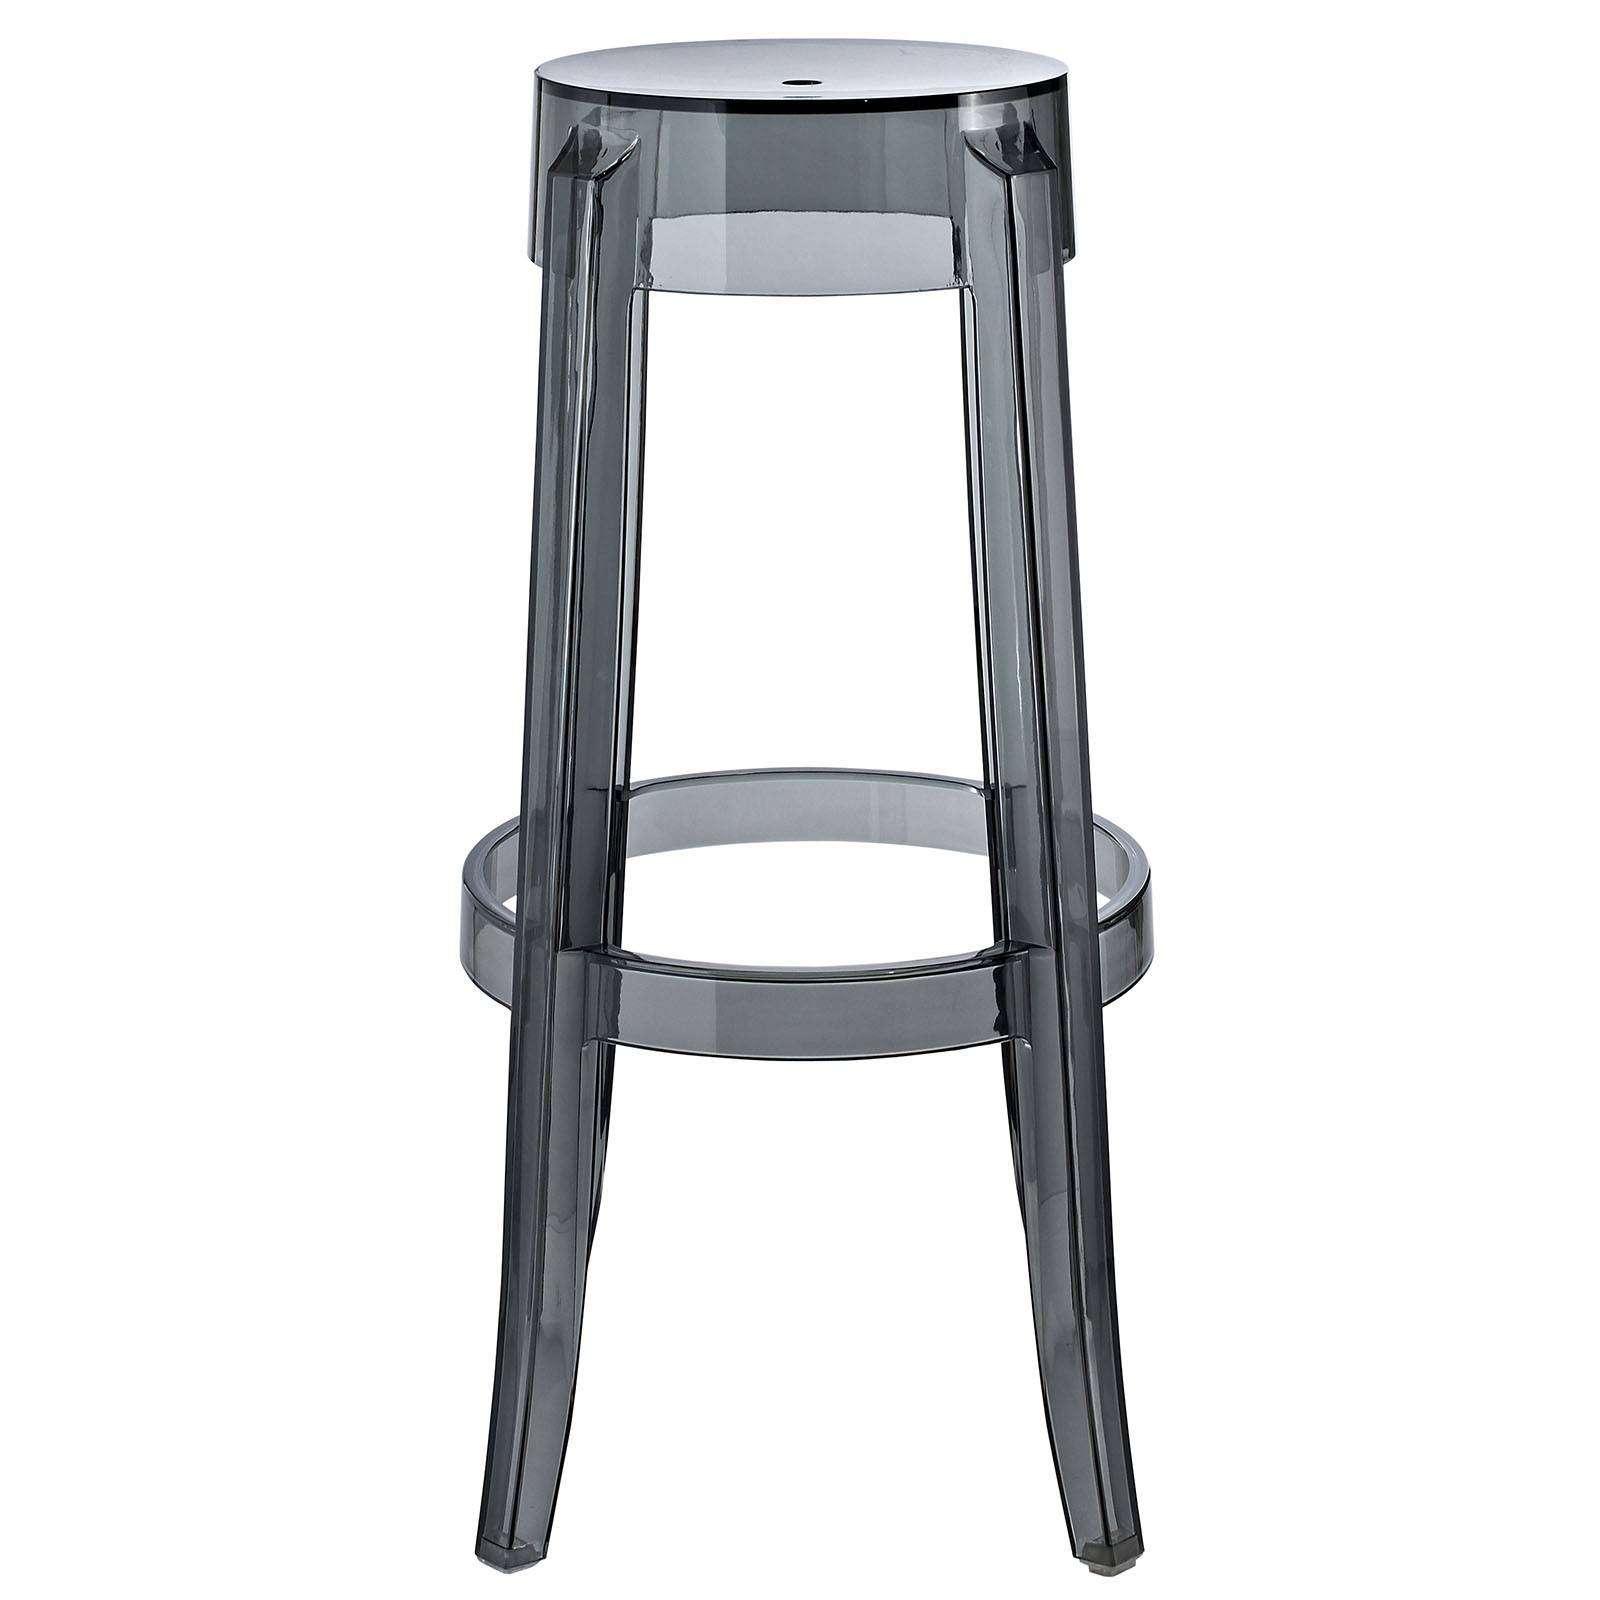 ghost chair bar stool wedding chairs hire birmingham philippe starck style charles